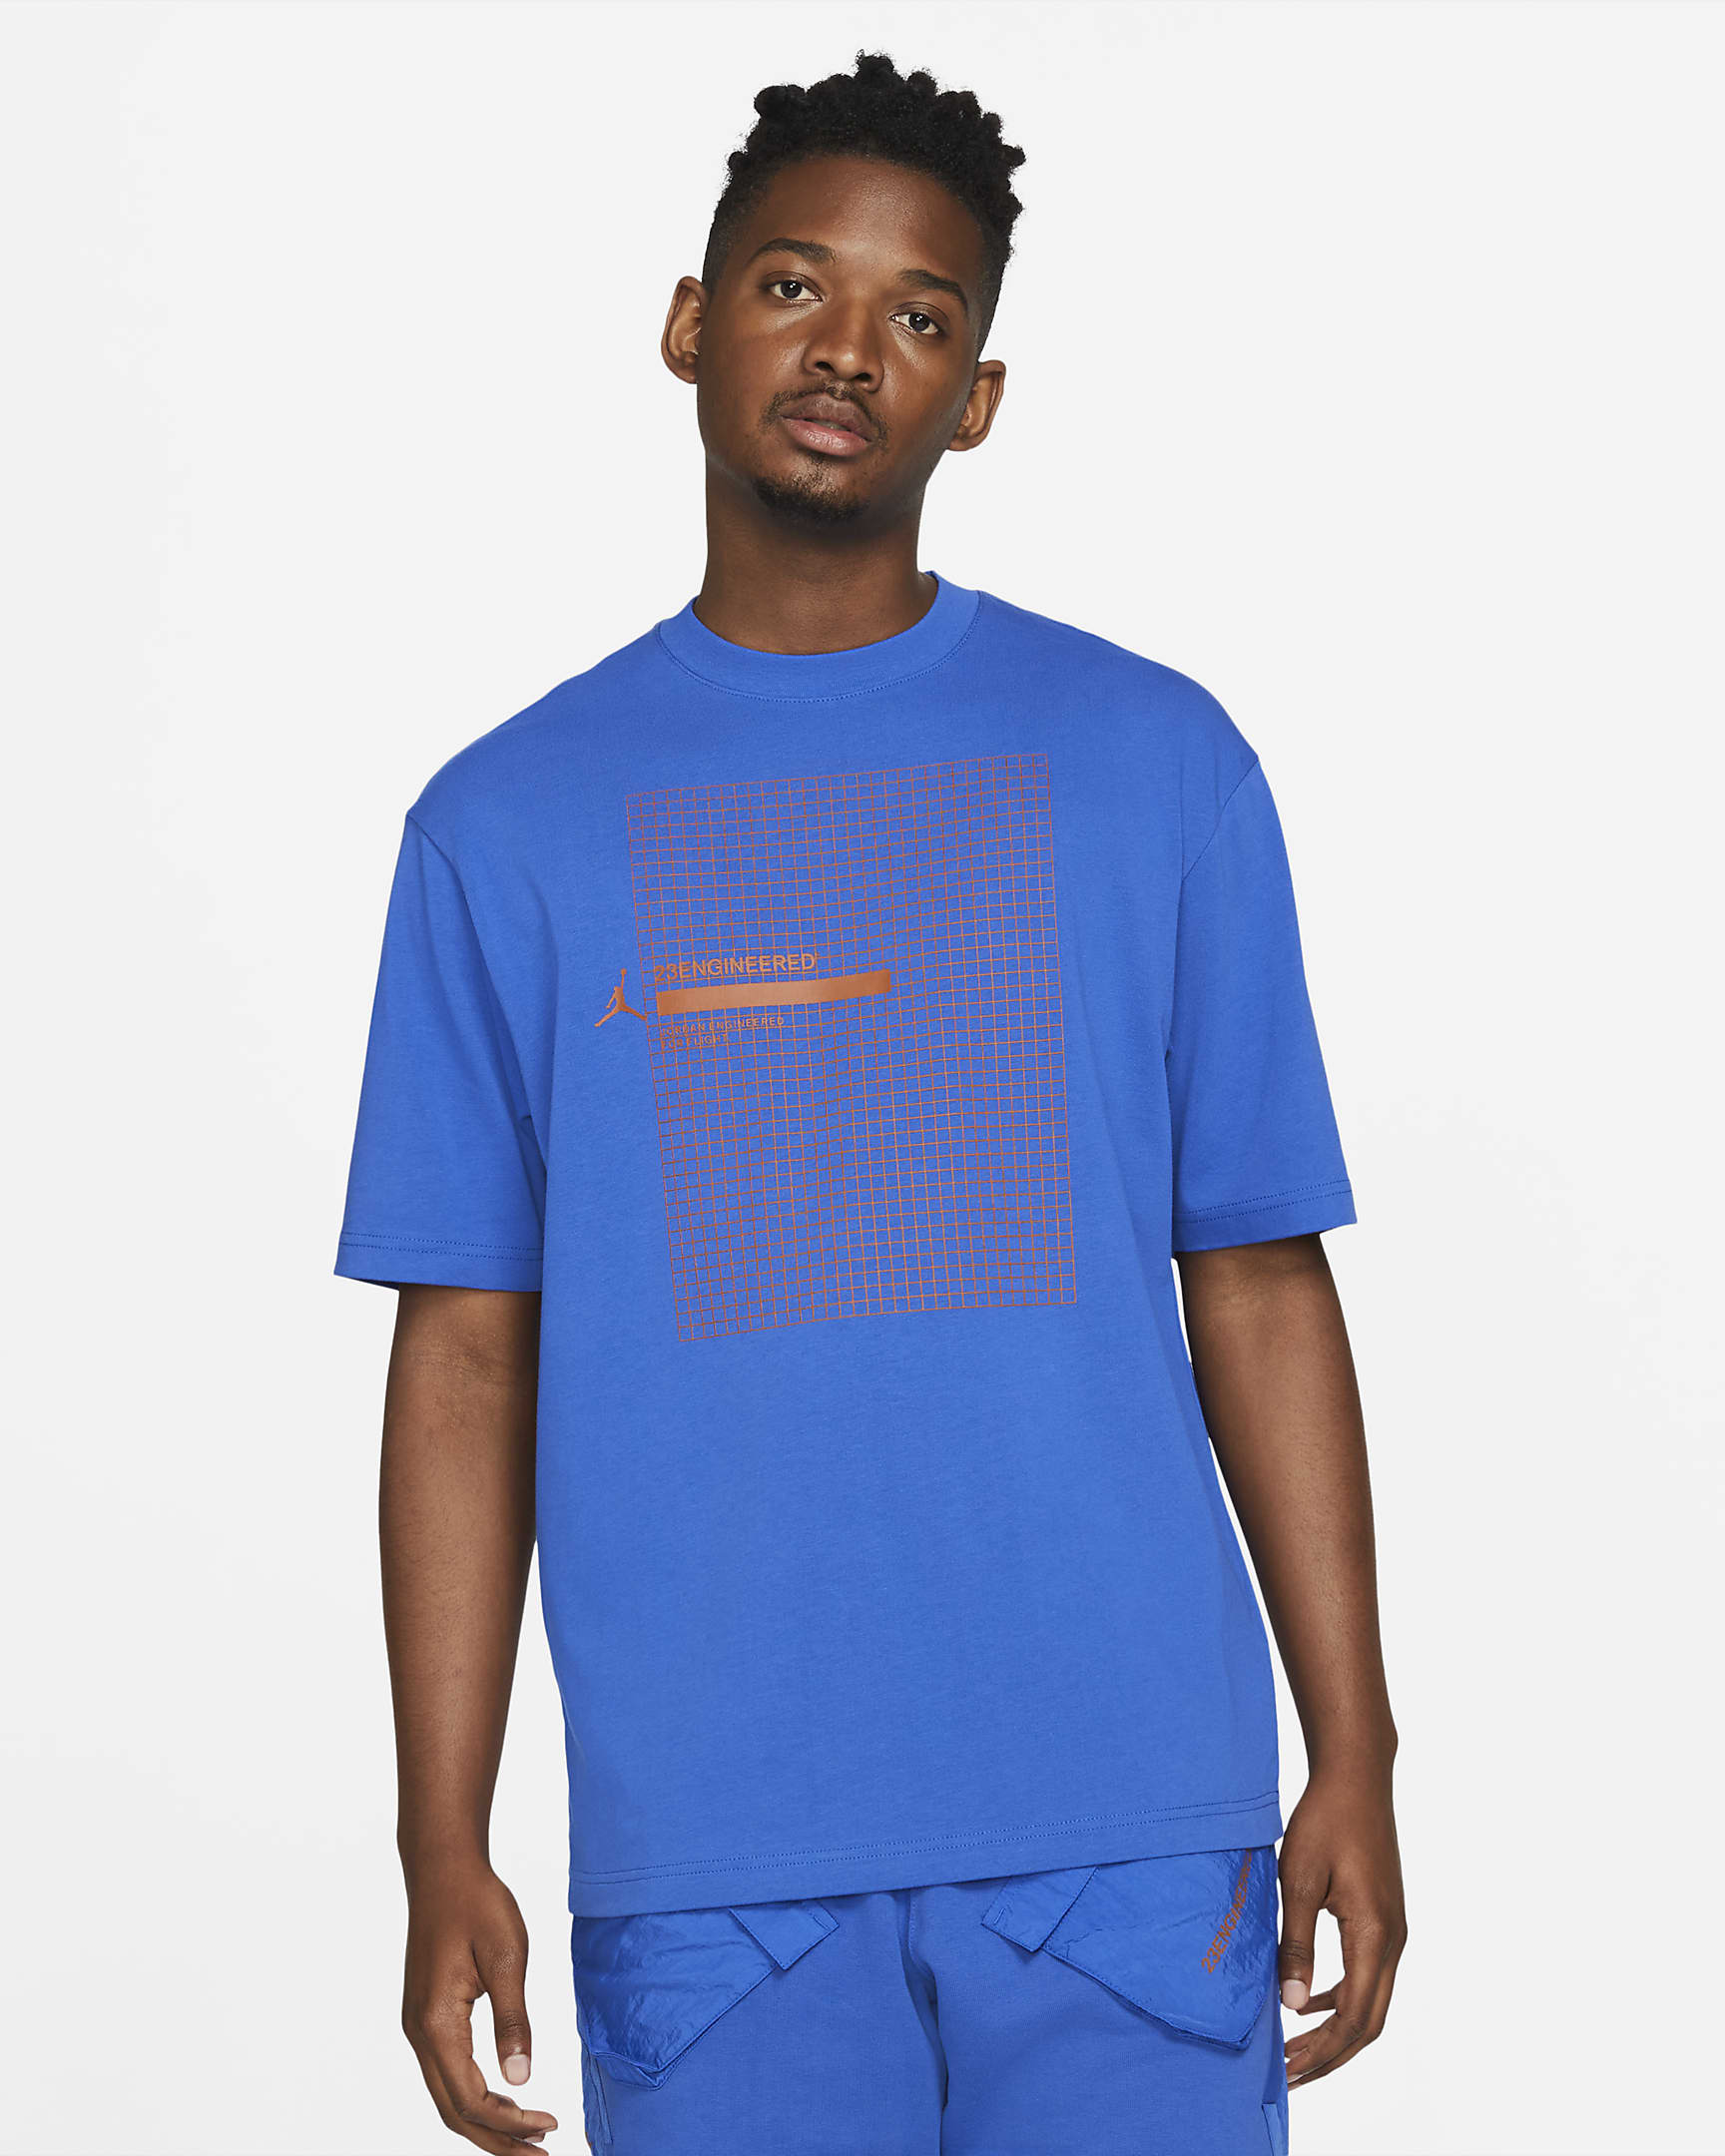 jordan-23-engineered-mens-short-sleeve-t-shirt-WwjbT9.png